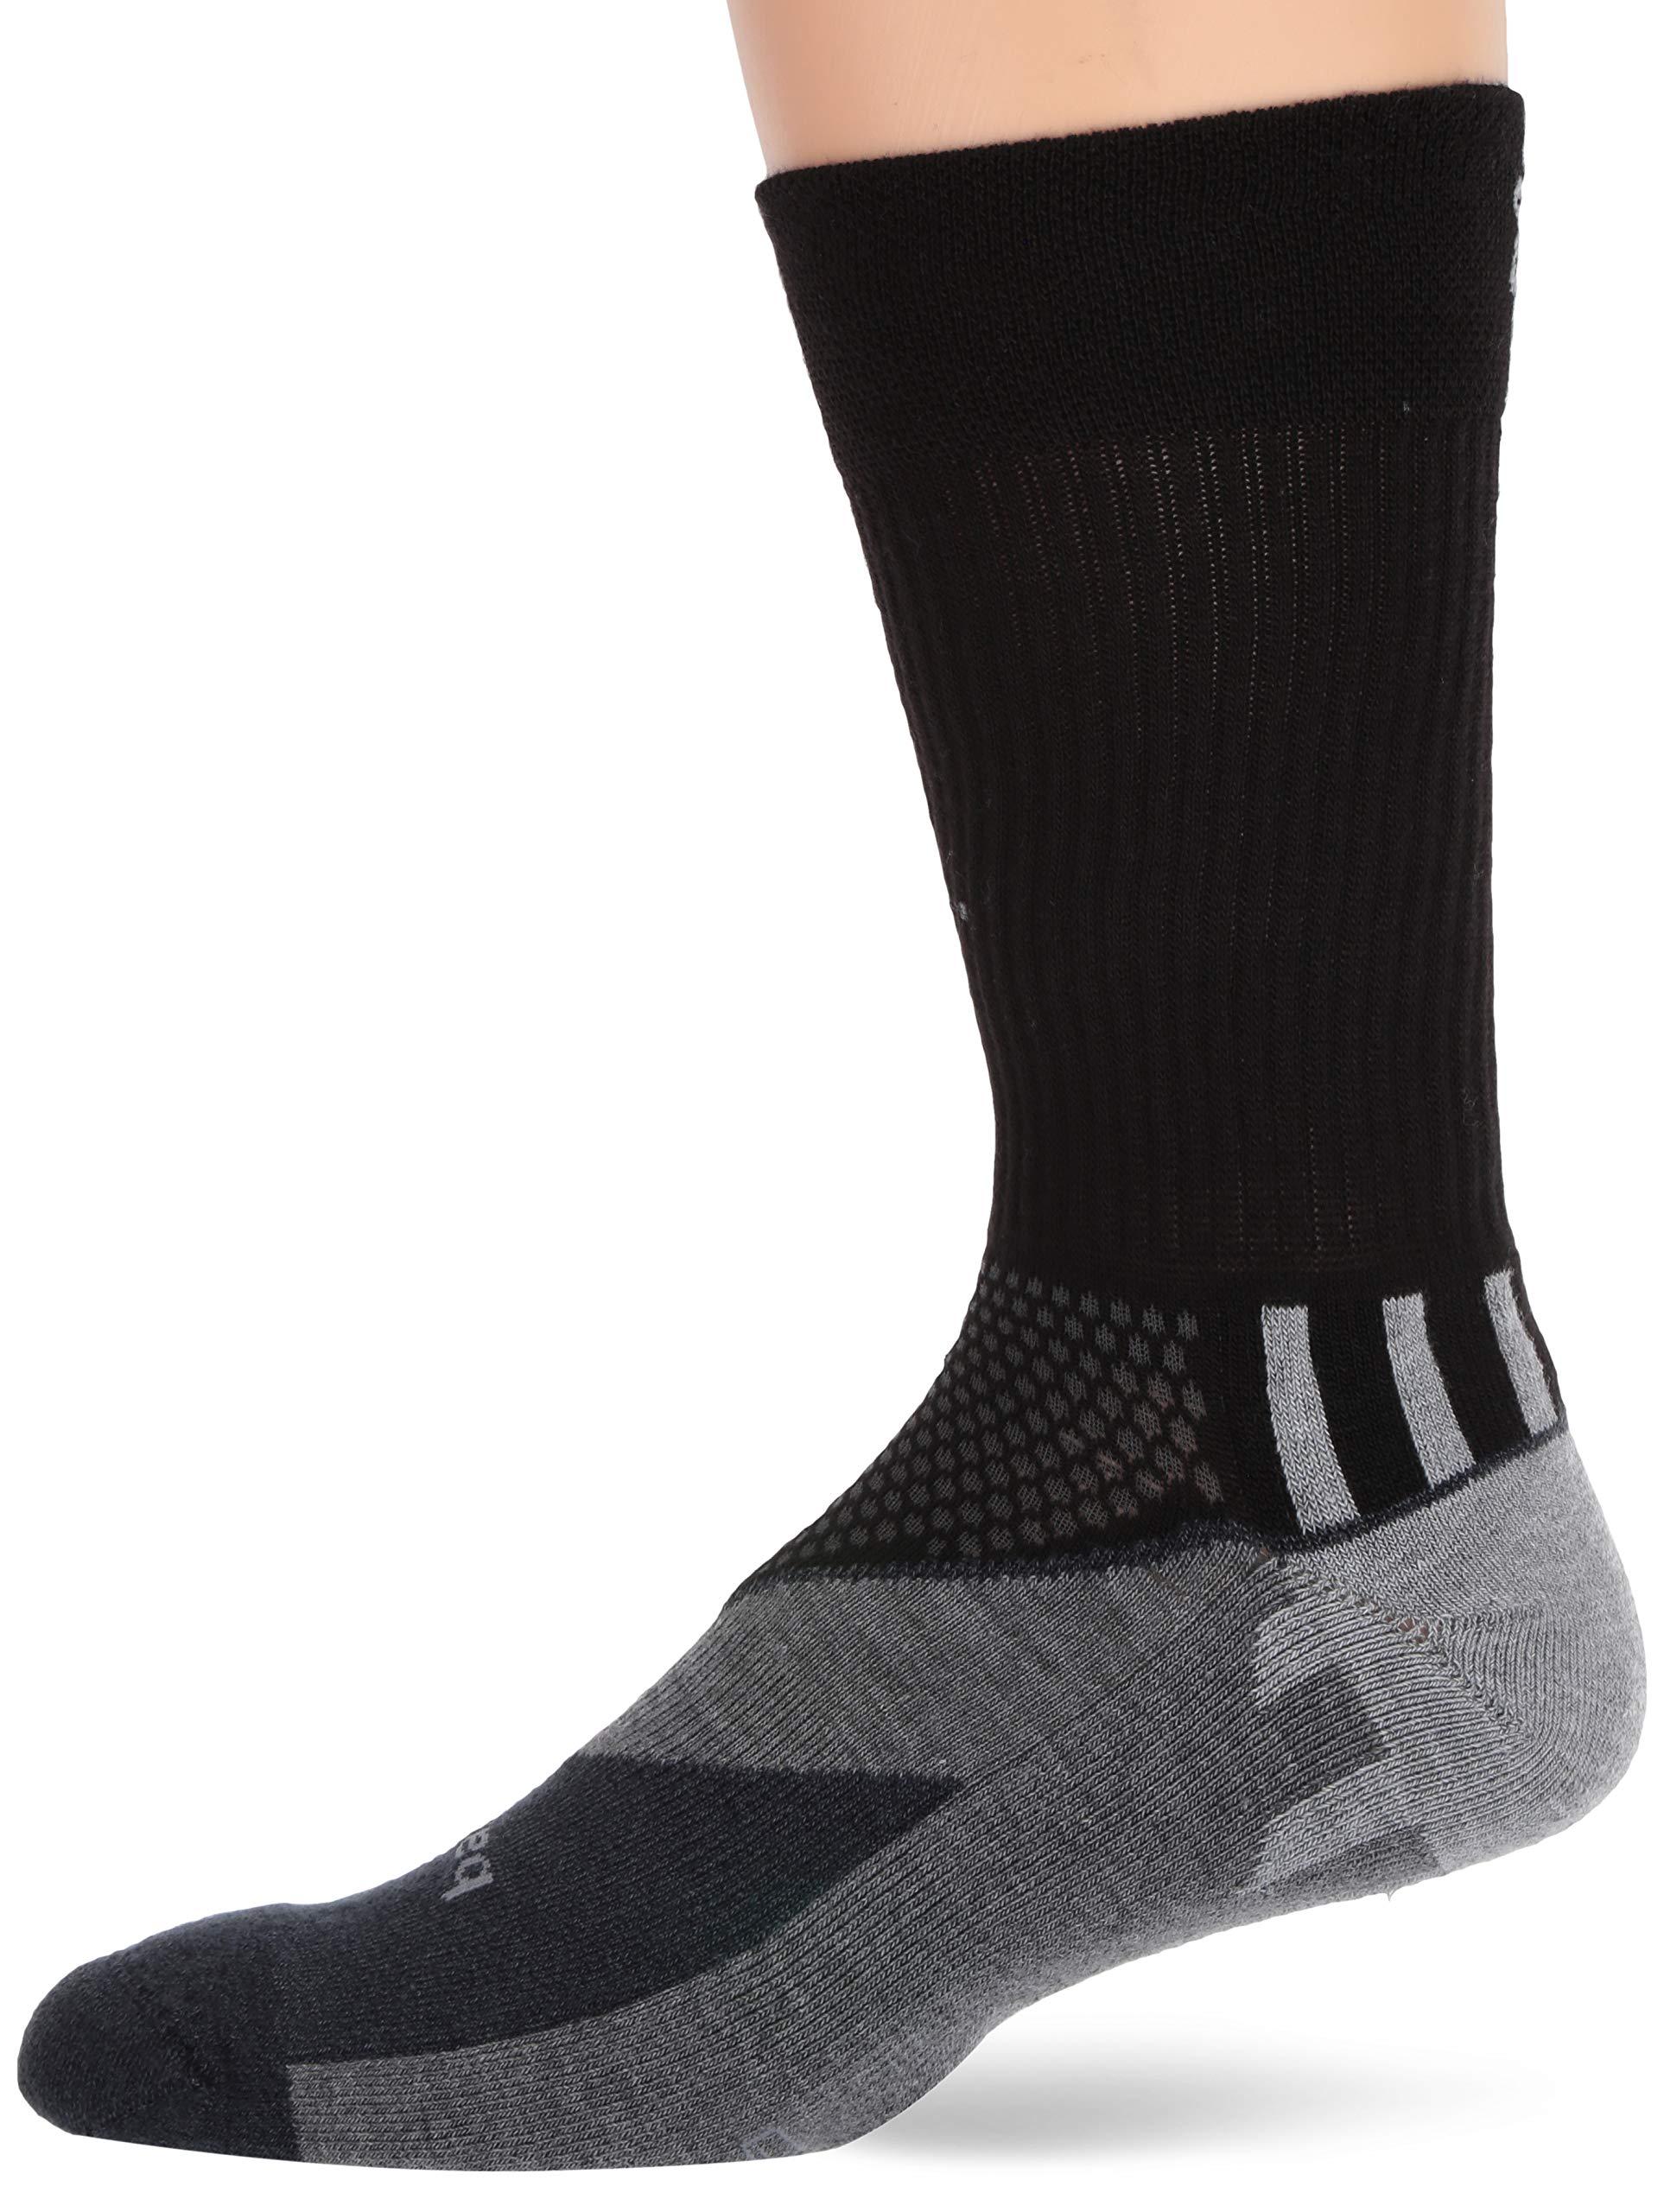 Balega Enduro V Tech Socks Heather